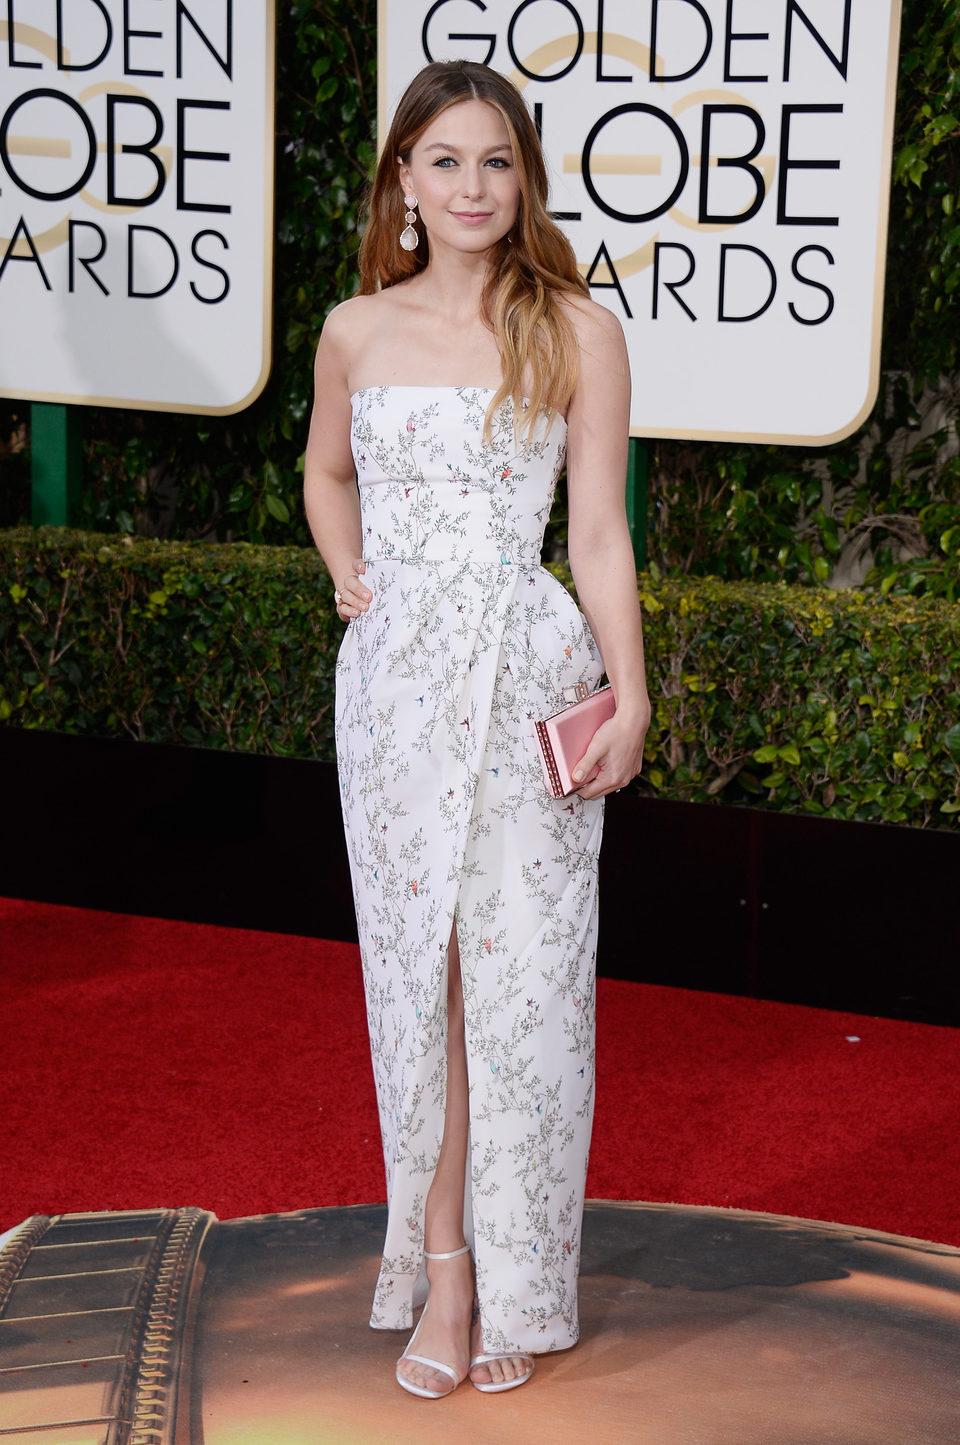 Melissa Benoist in the 2016 Golden Globes red carpet